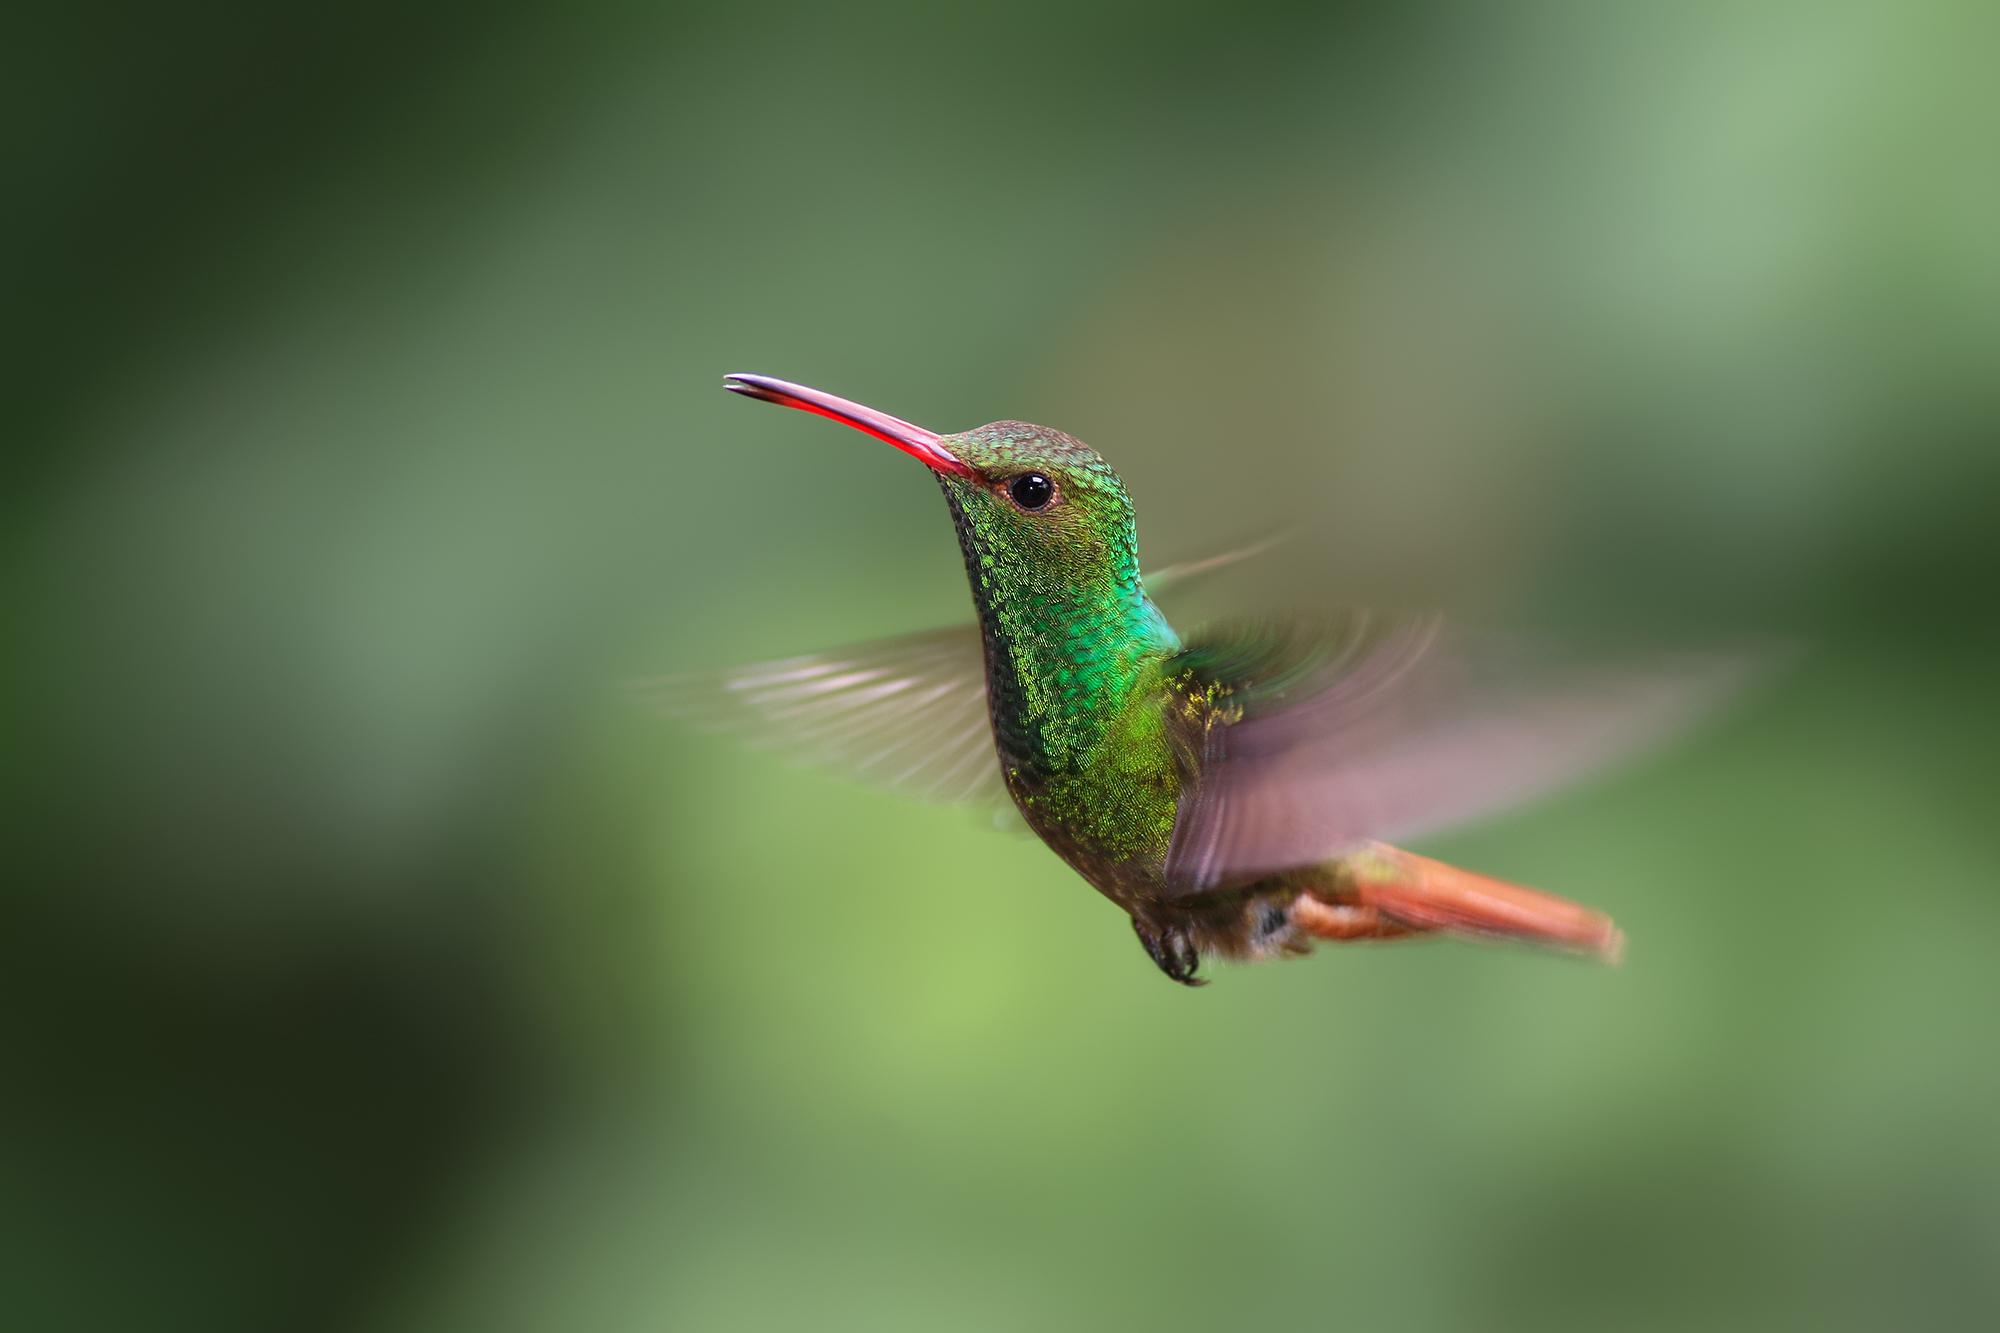 Roufus-tailed-Hummingbird-JPEG_web.jpg